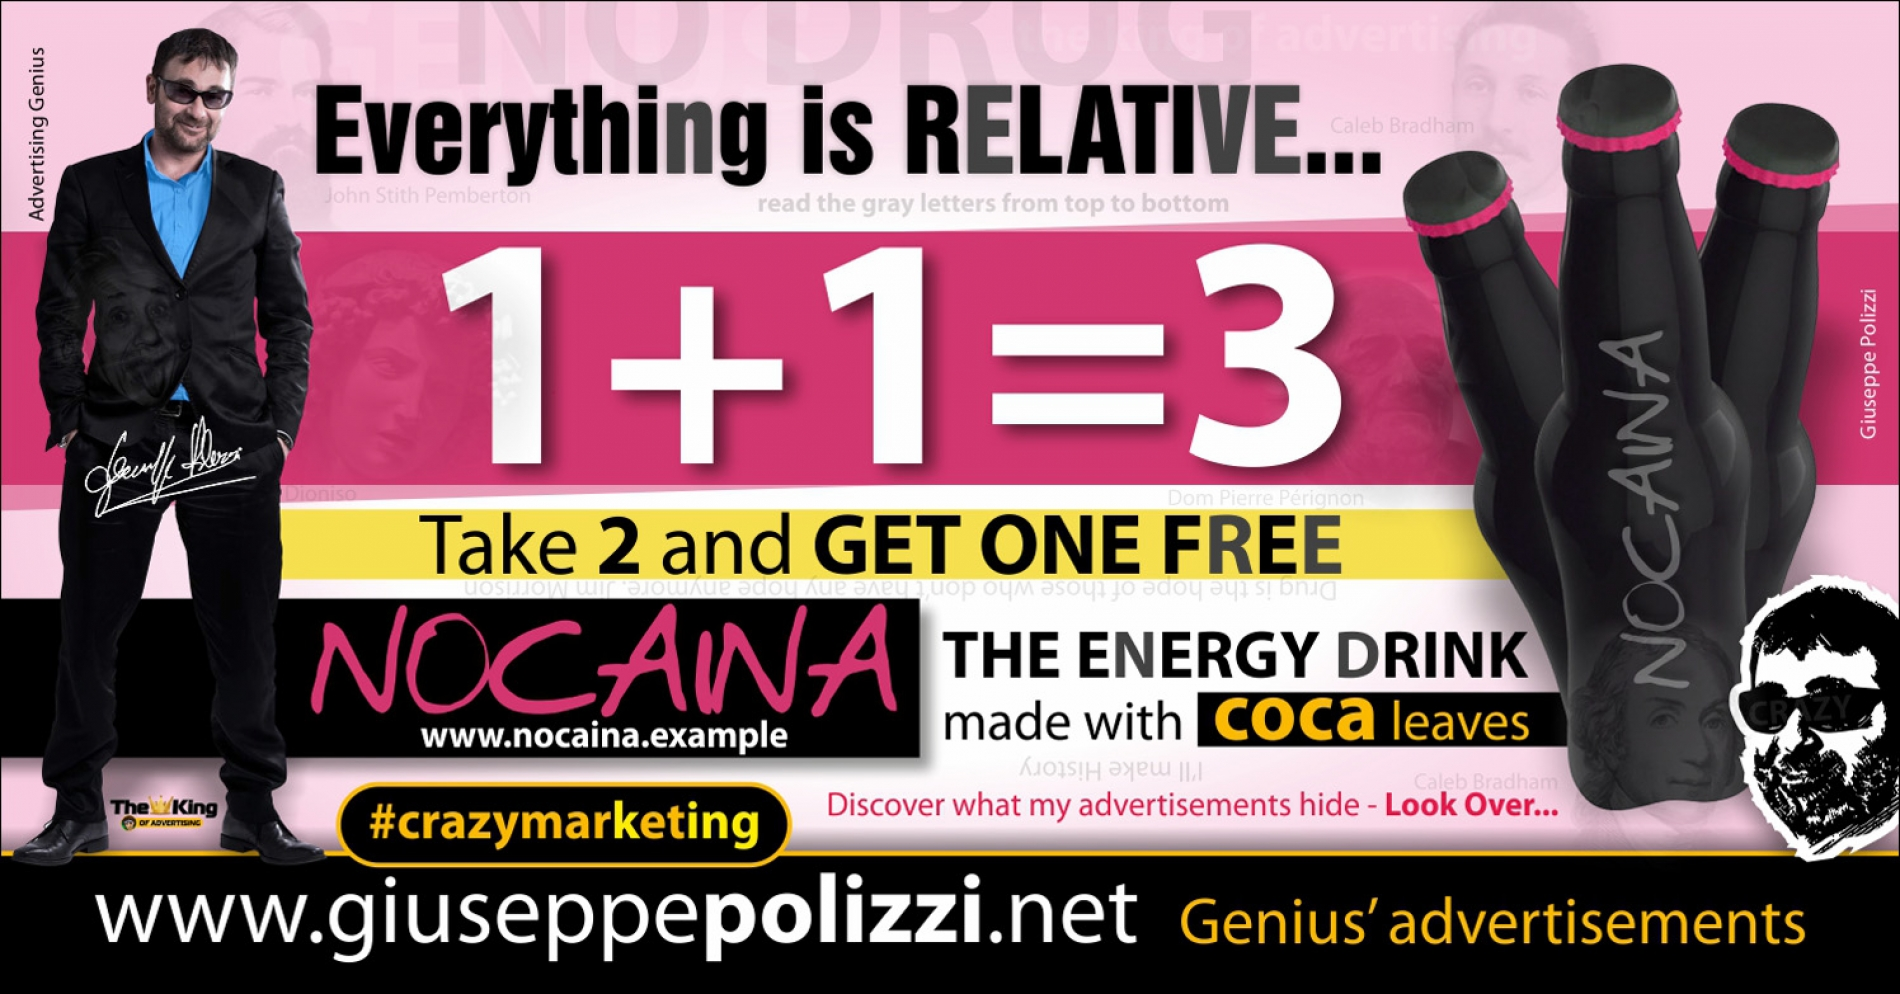 giuseppe polizzi advertisement NOCAINA crazy marketing genius  2017